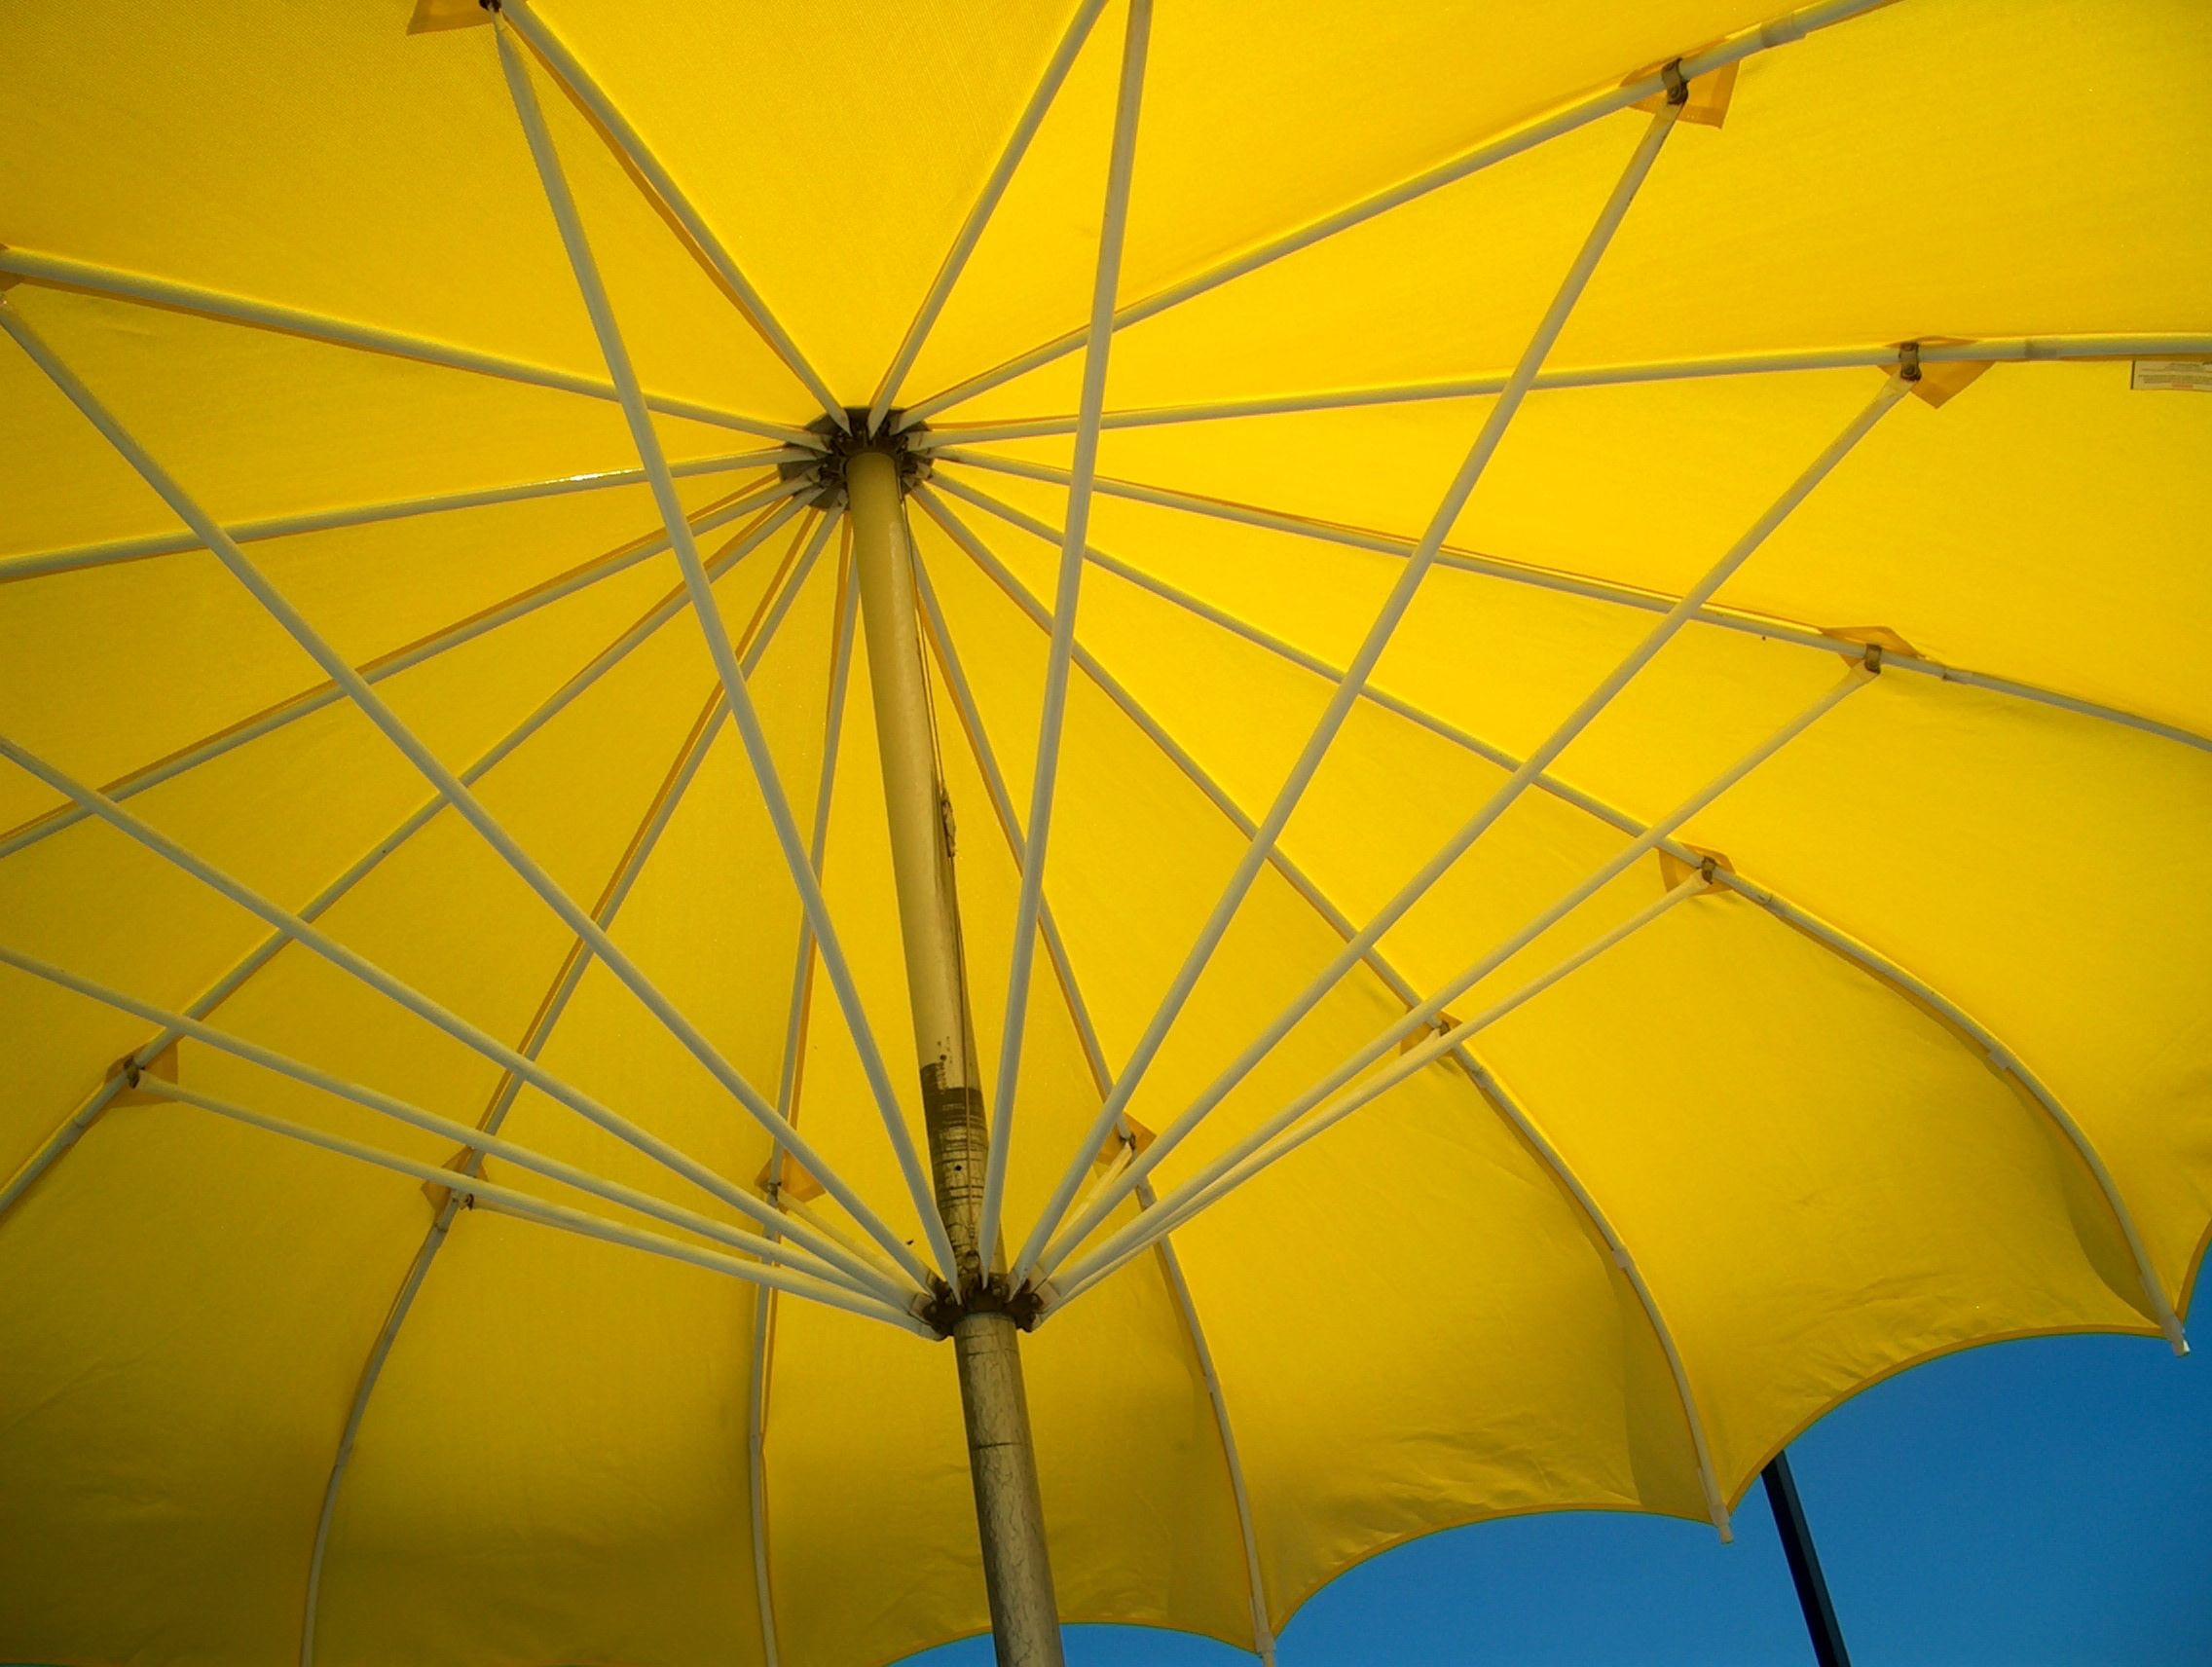 Yellow_umbrella.jpg (2272×1712)